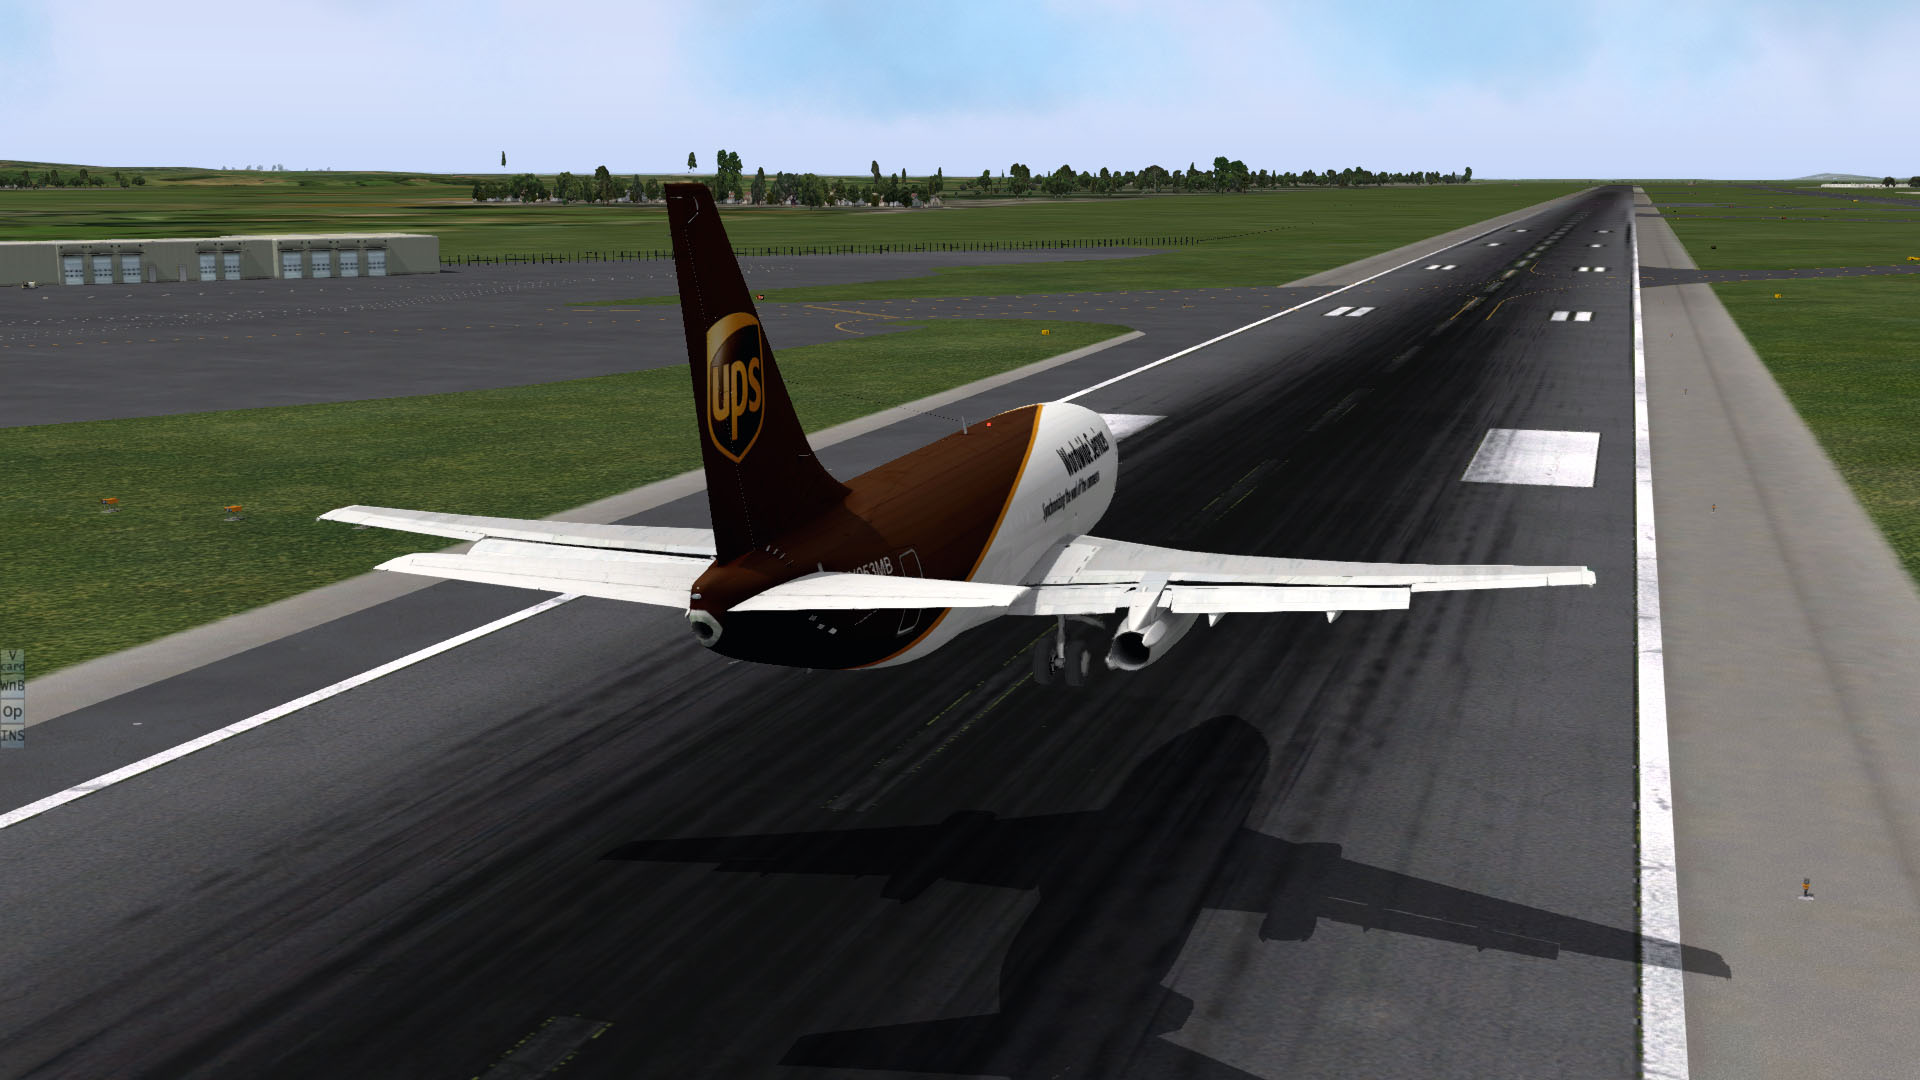 UPS - Boeing 737-200 TwinJet - FlyJSim - AEROSOFT COMMUNITY SERVICES